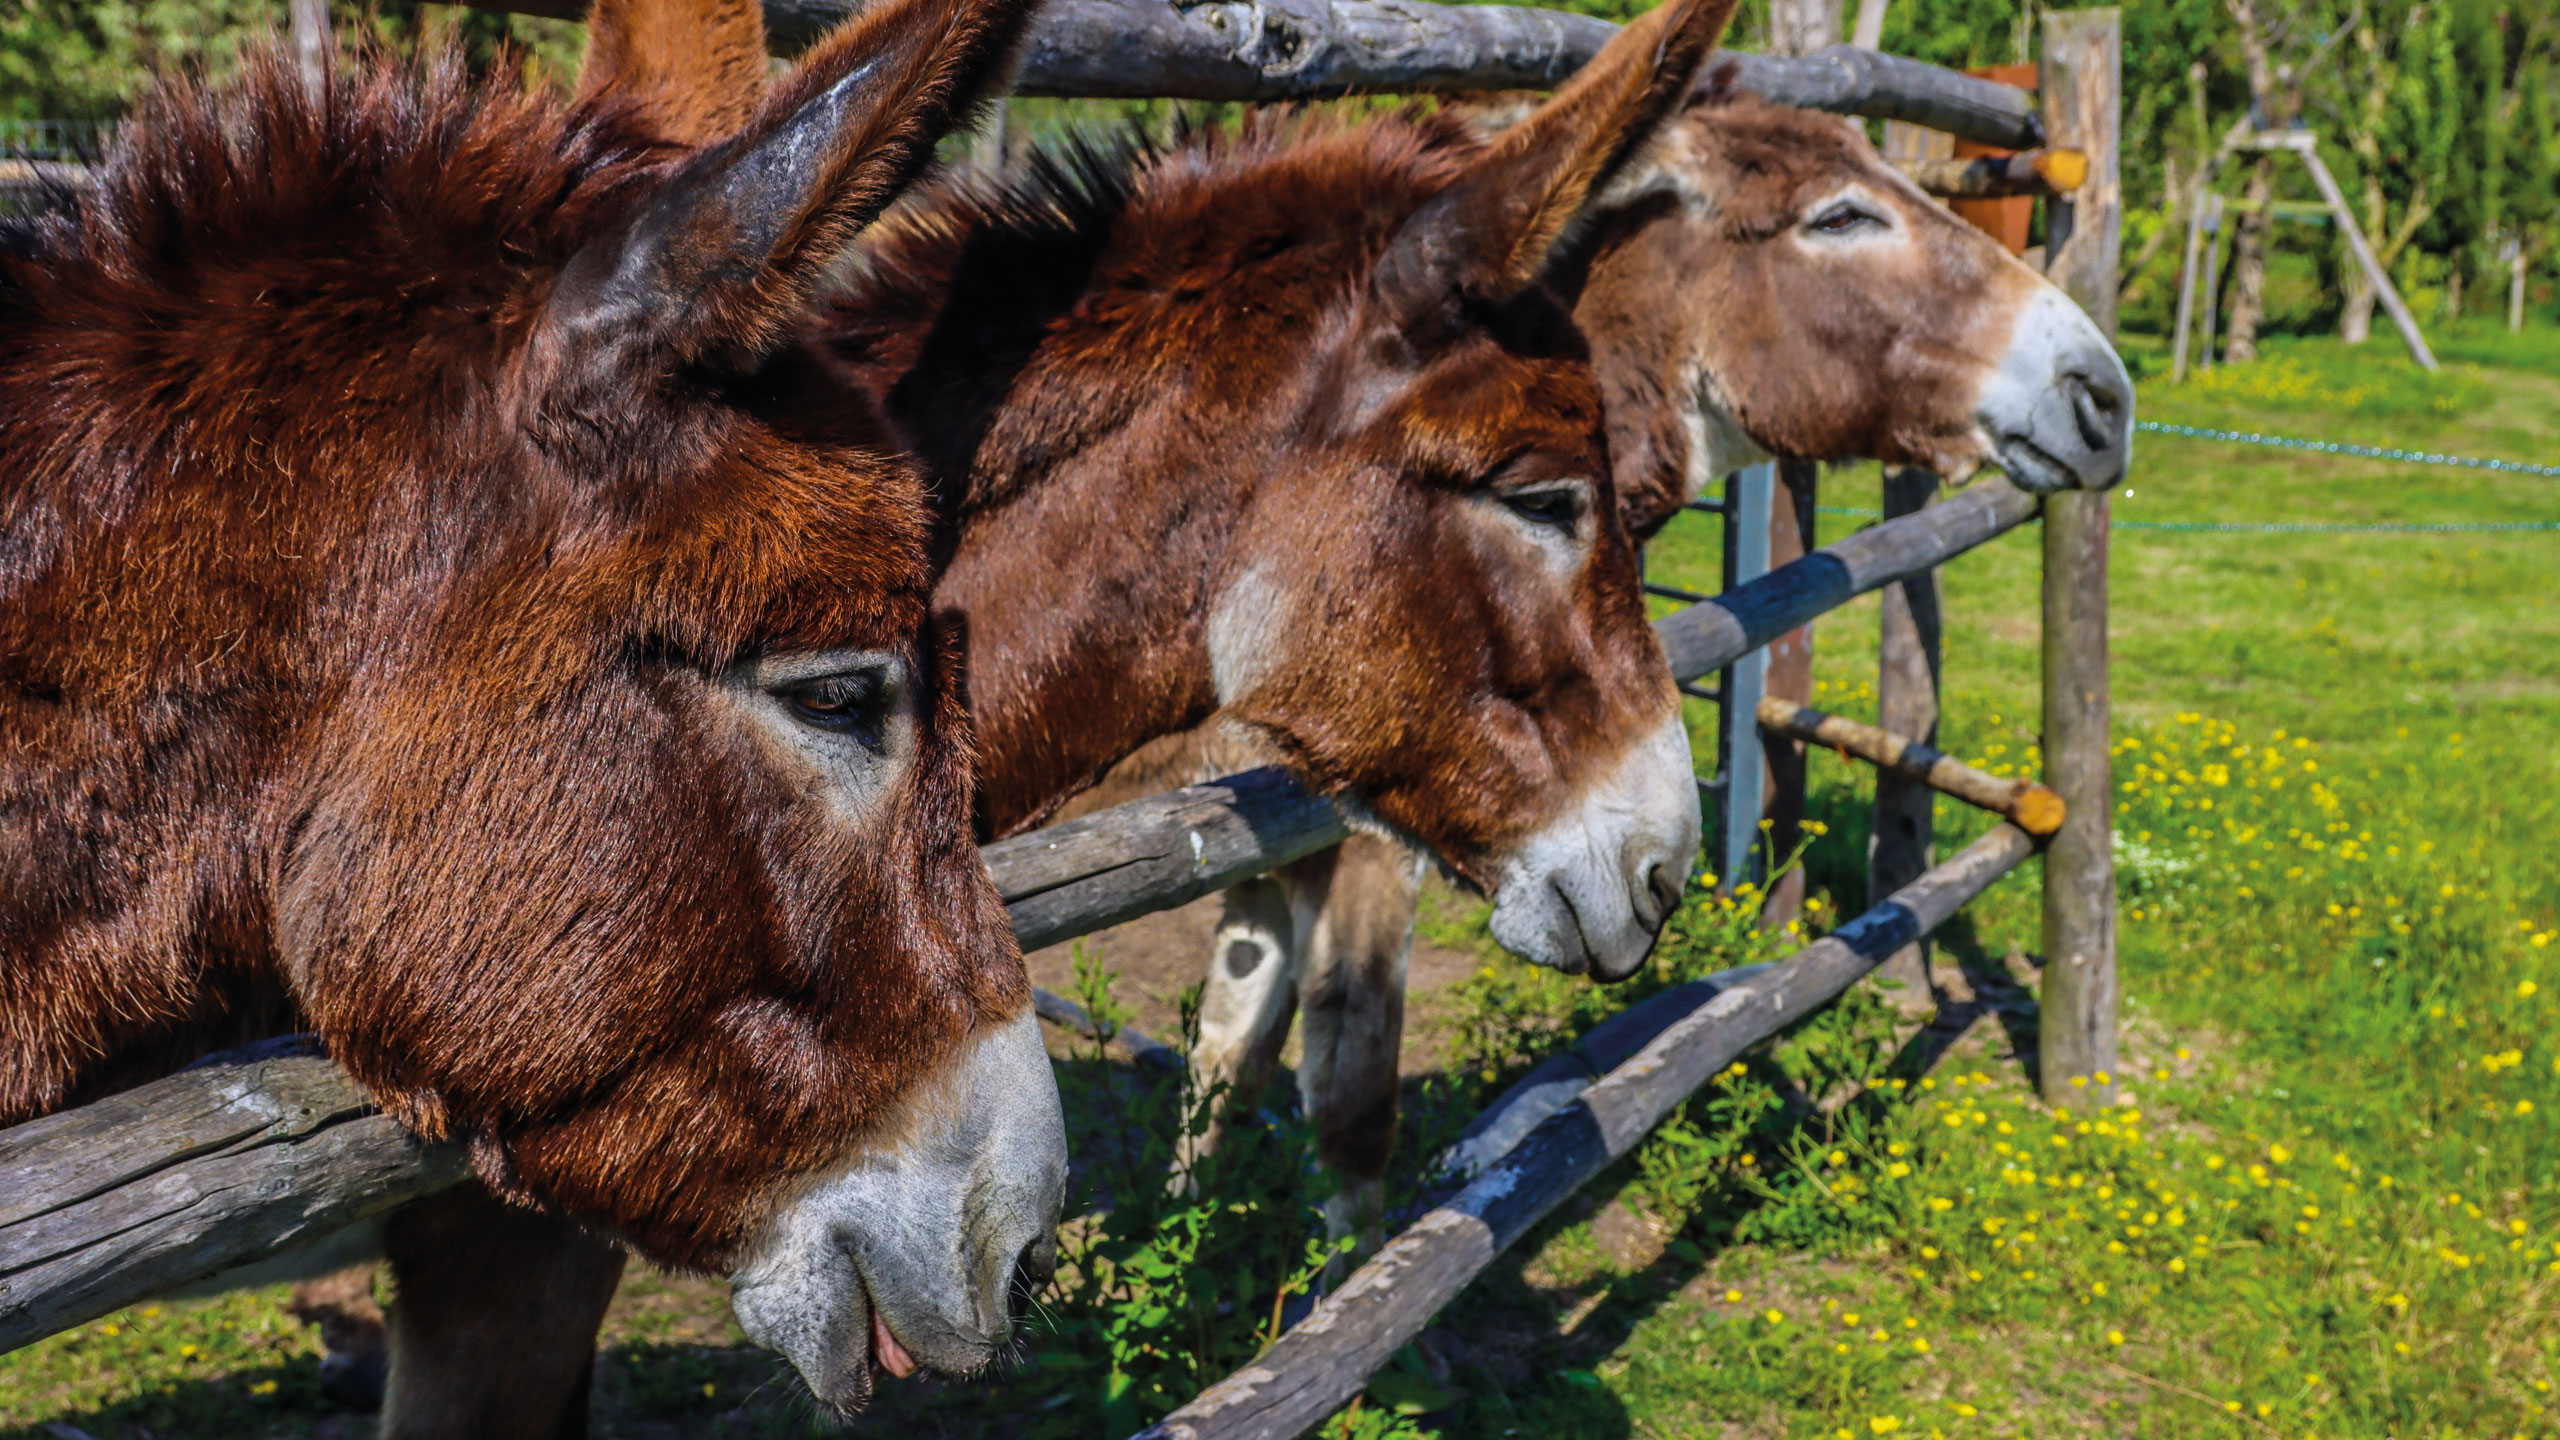 donkey, burro, queso